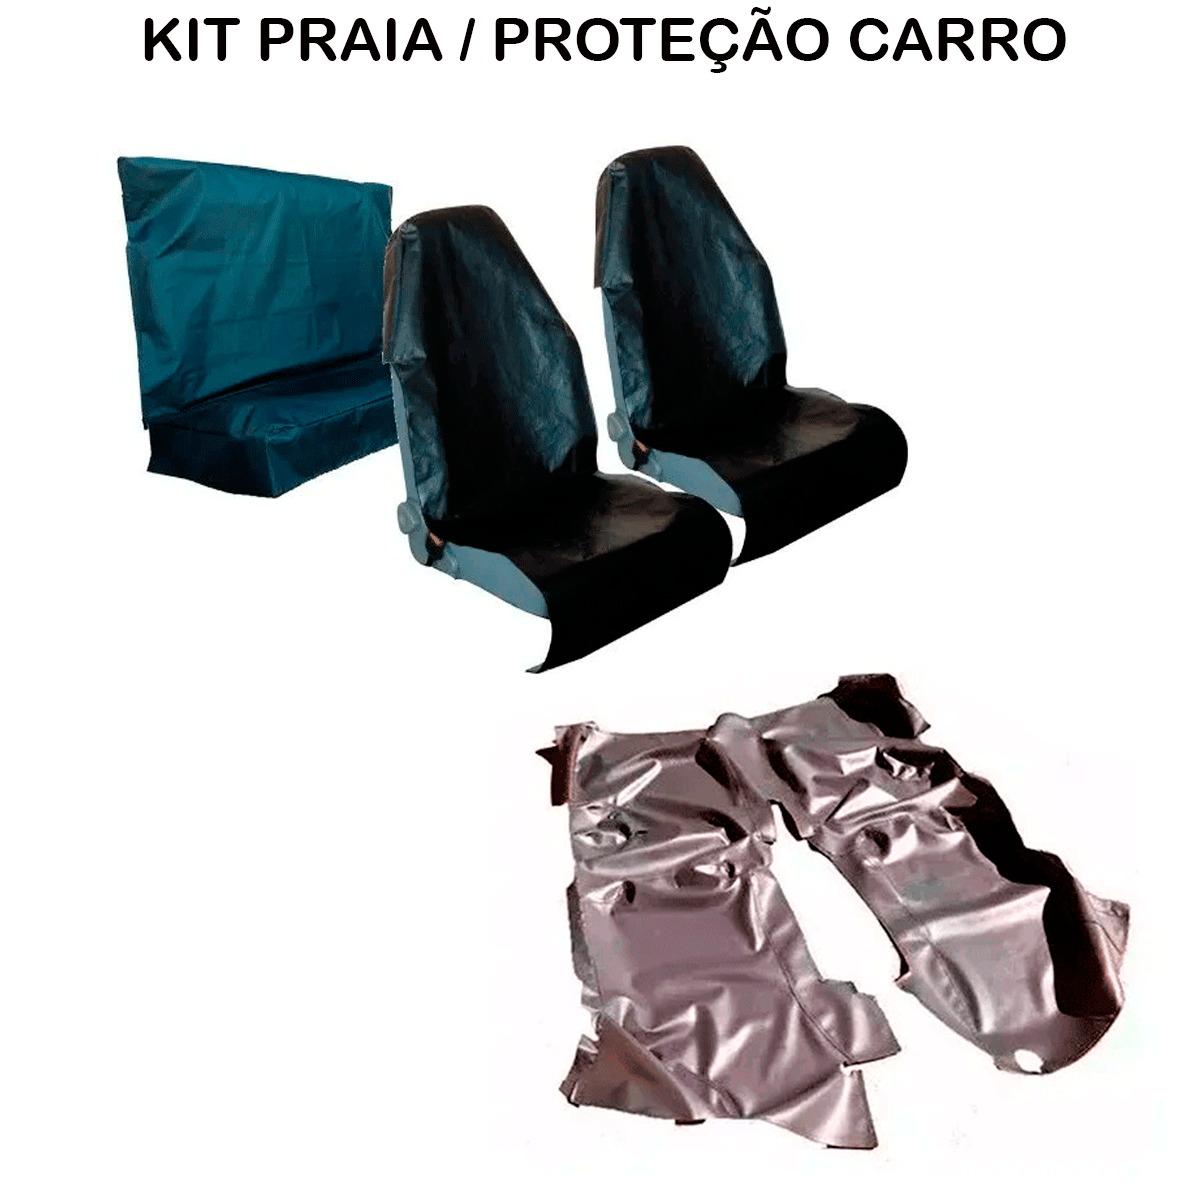 Tapete Em Vinil Fiat Palio 2003 a 2013 + Capa Banco Protecao Banco Areia Suor Academia